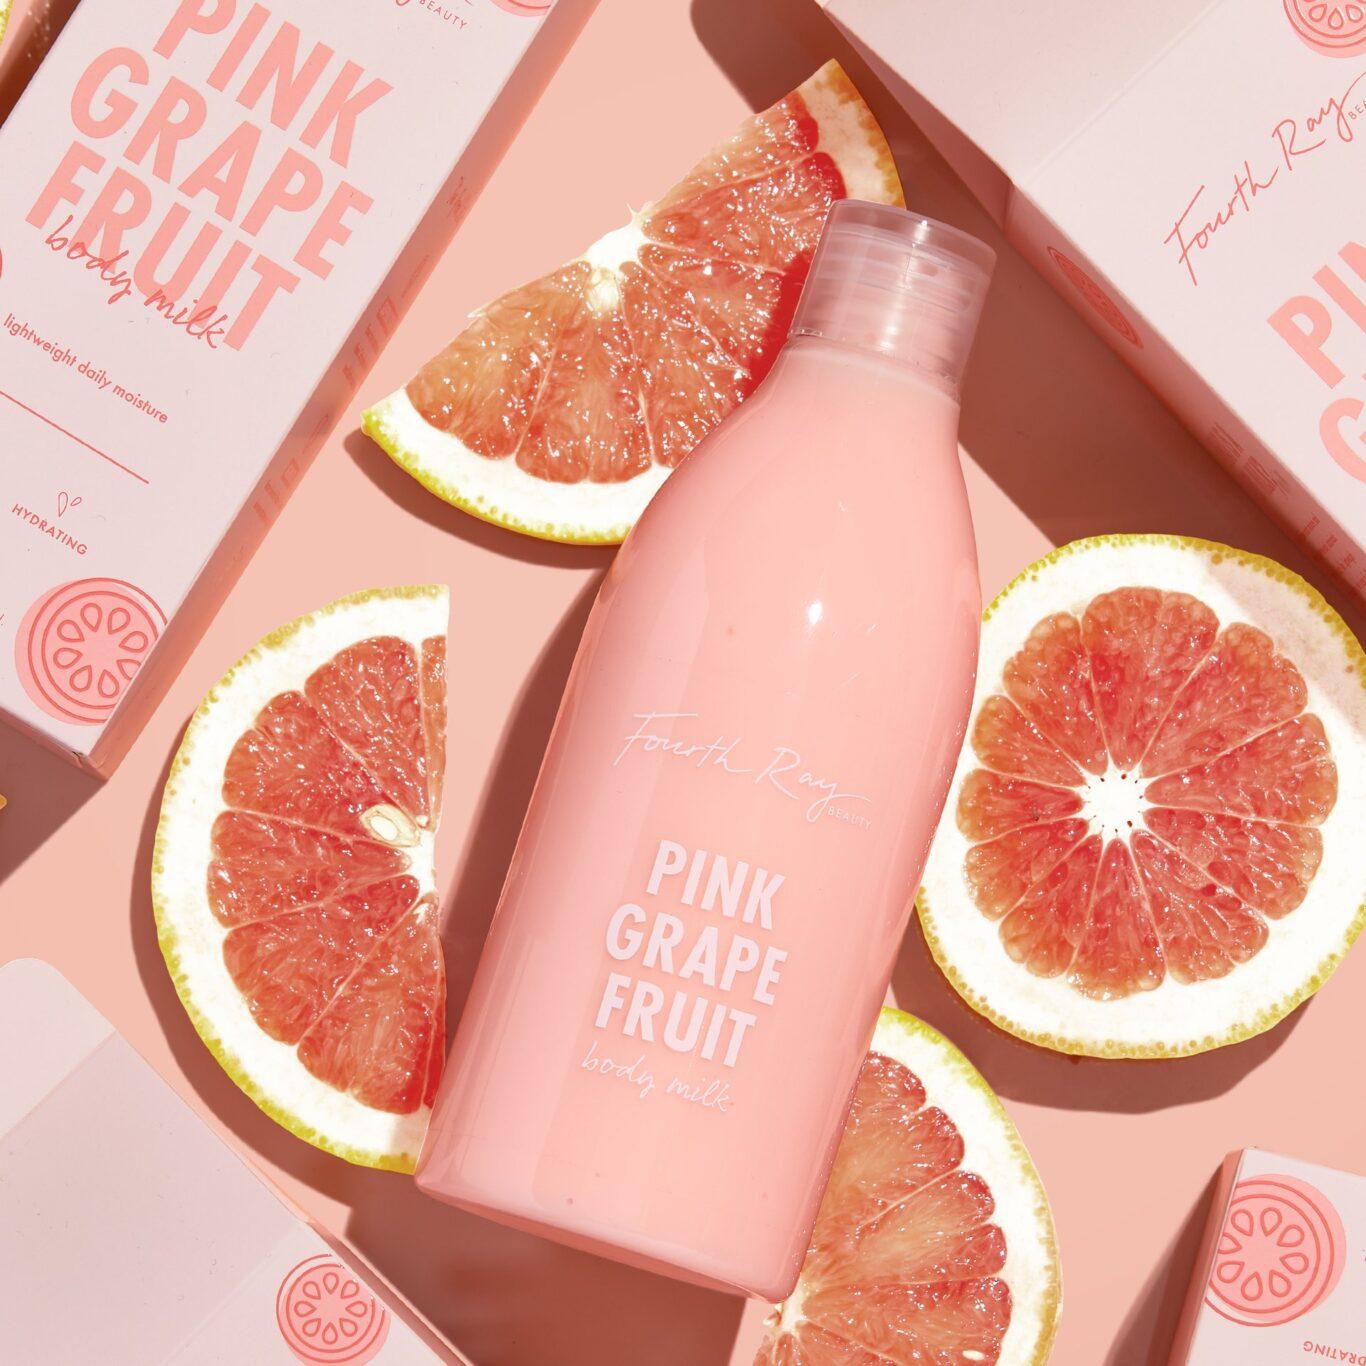 Fourth Ray Beauty Body Milks Pink Grapefruit